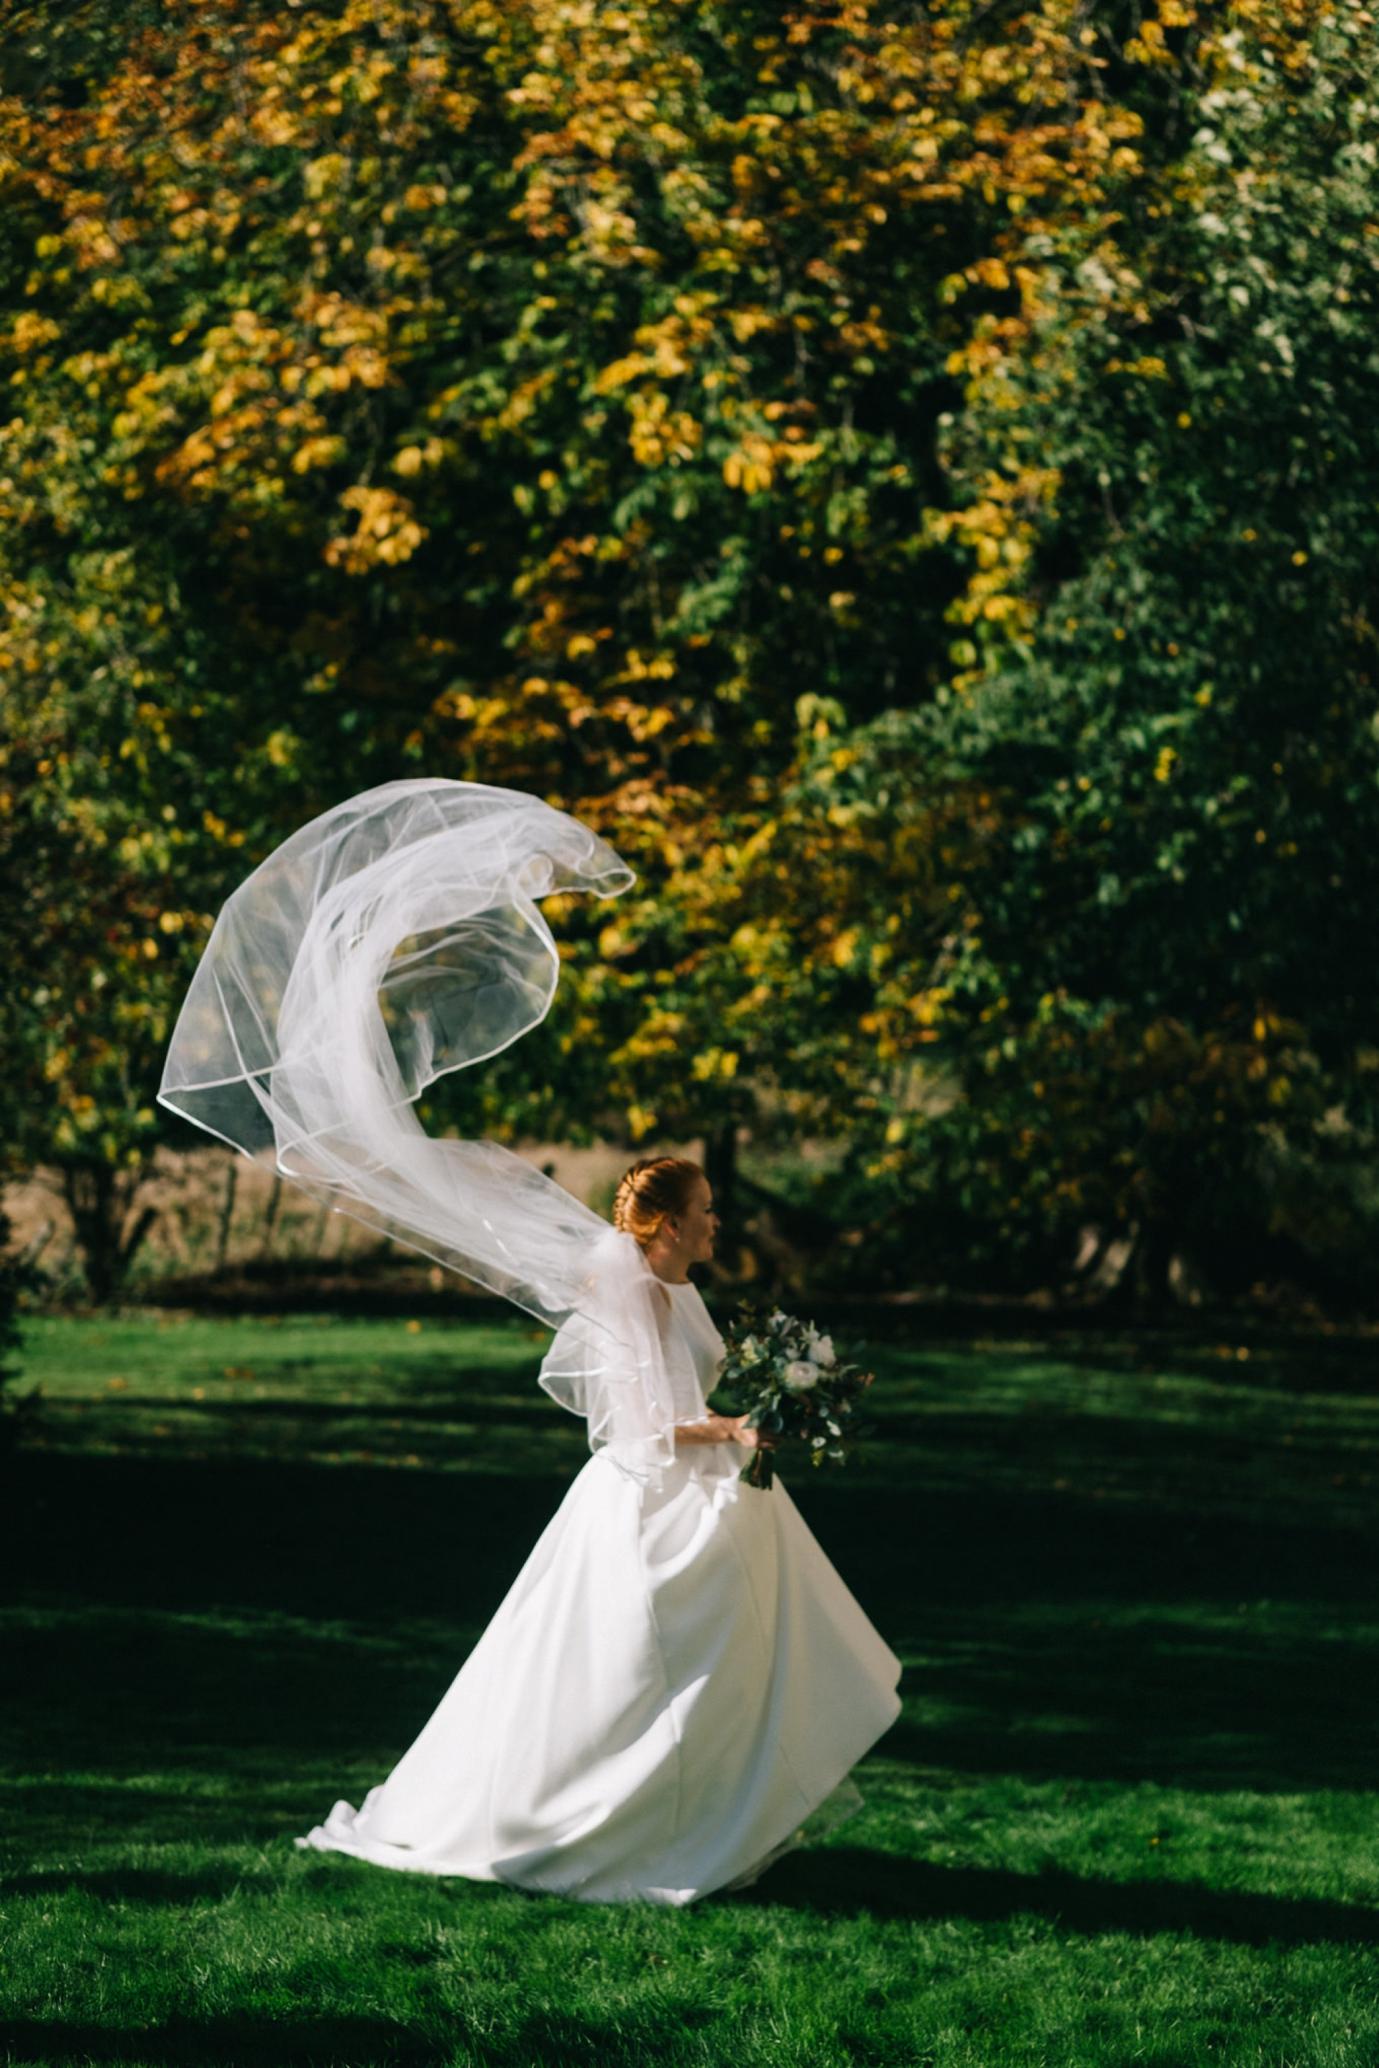 20171007_euan robertson weddings_068_WEB.jpg